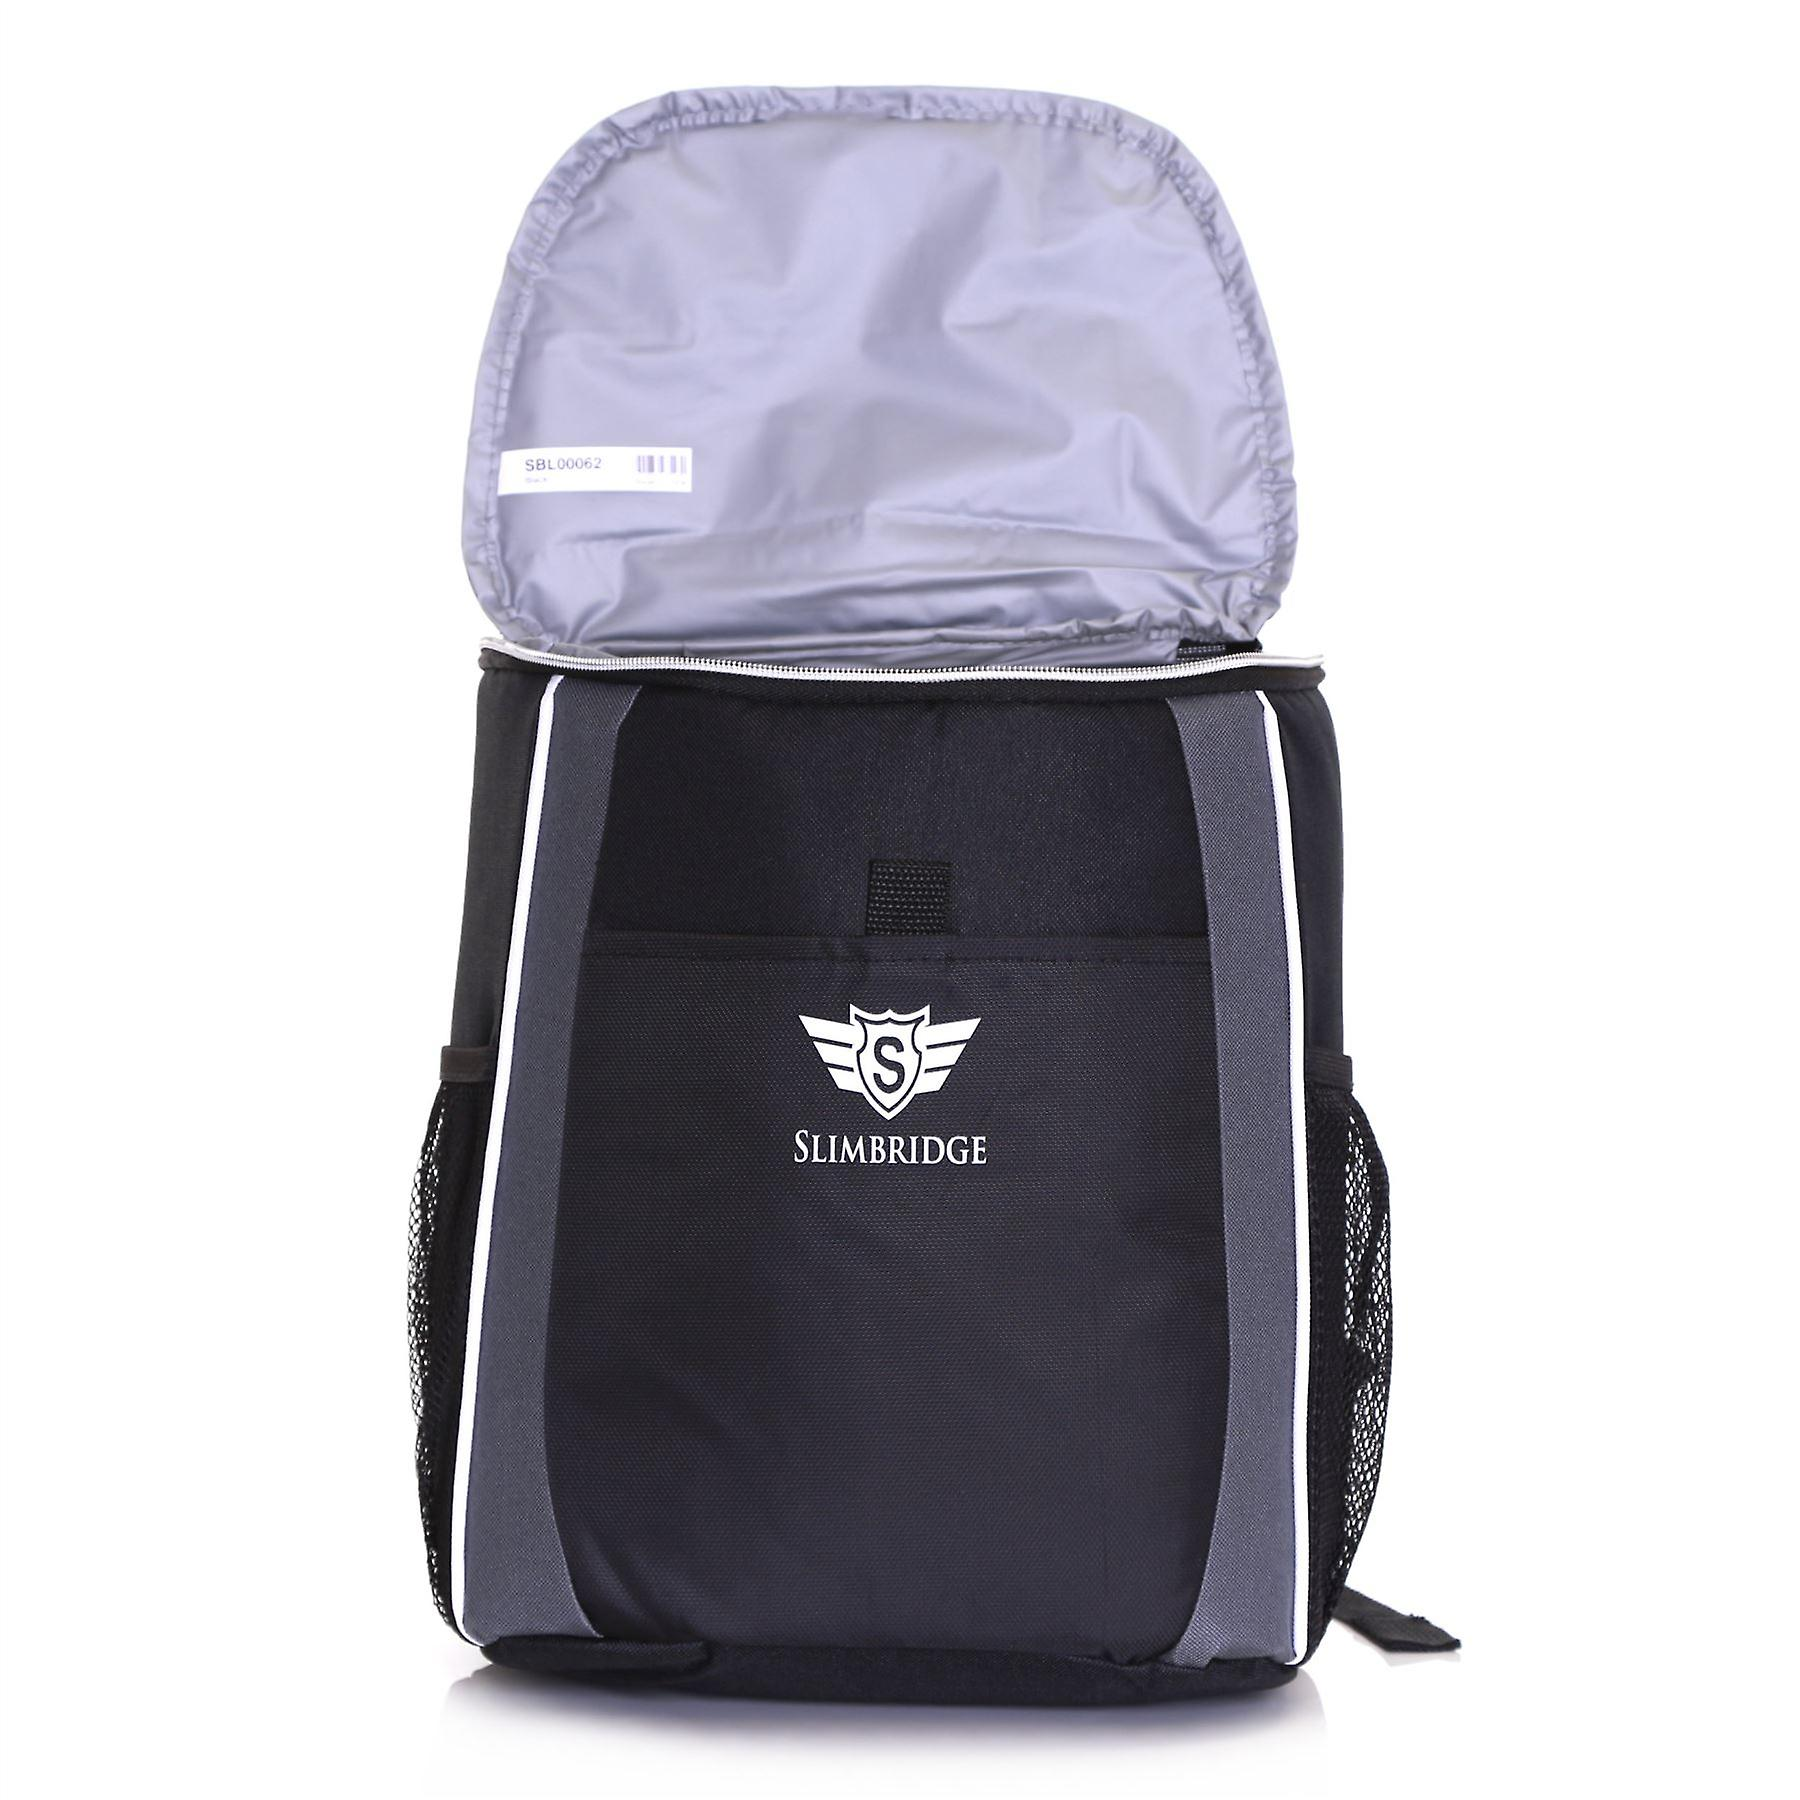 Slimbridge Brean Insulated Picnic Backpack, Black